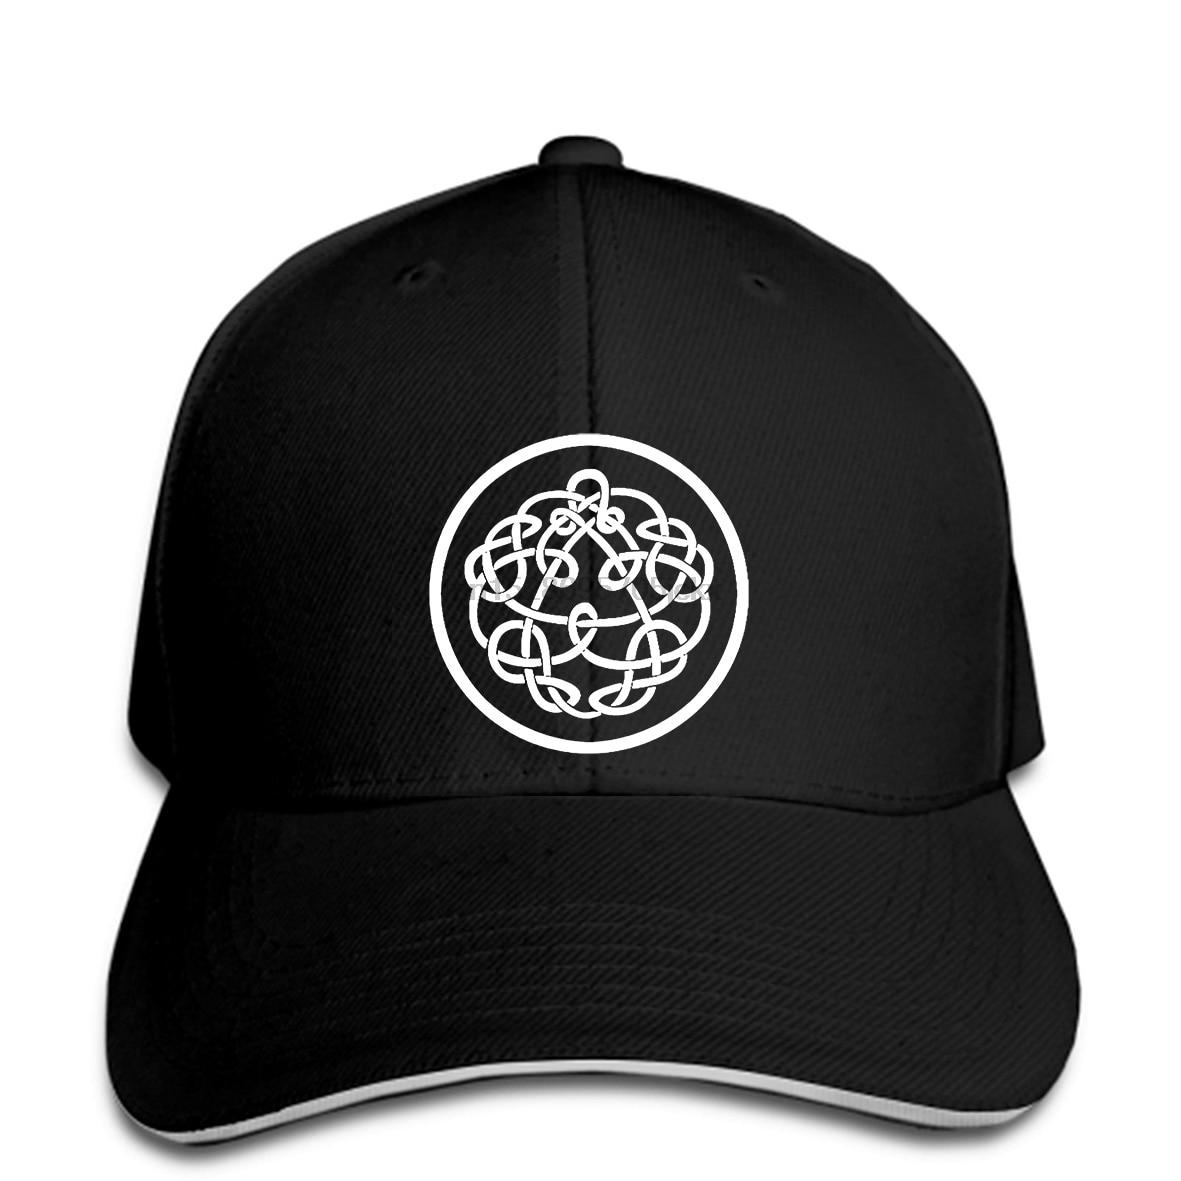 Gorra de béisbol estampada Harajuku para hombres, banda de Rock para hombres, gorra de béisbol con Logo rey Crimson